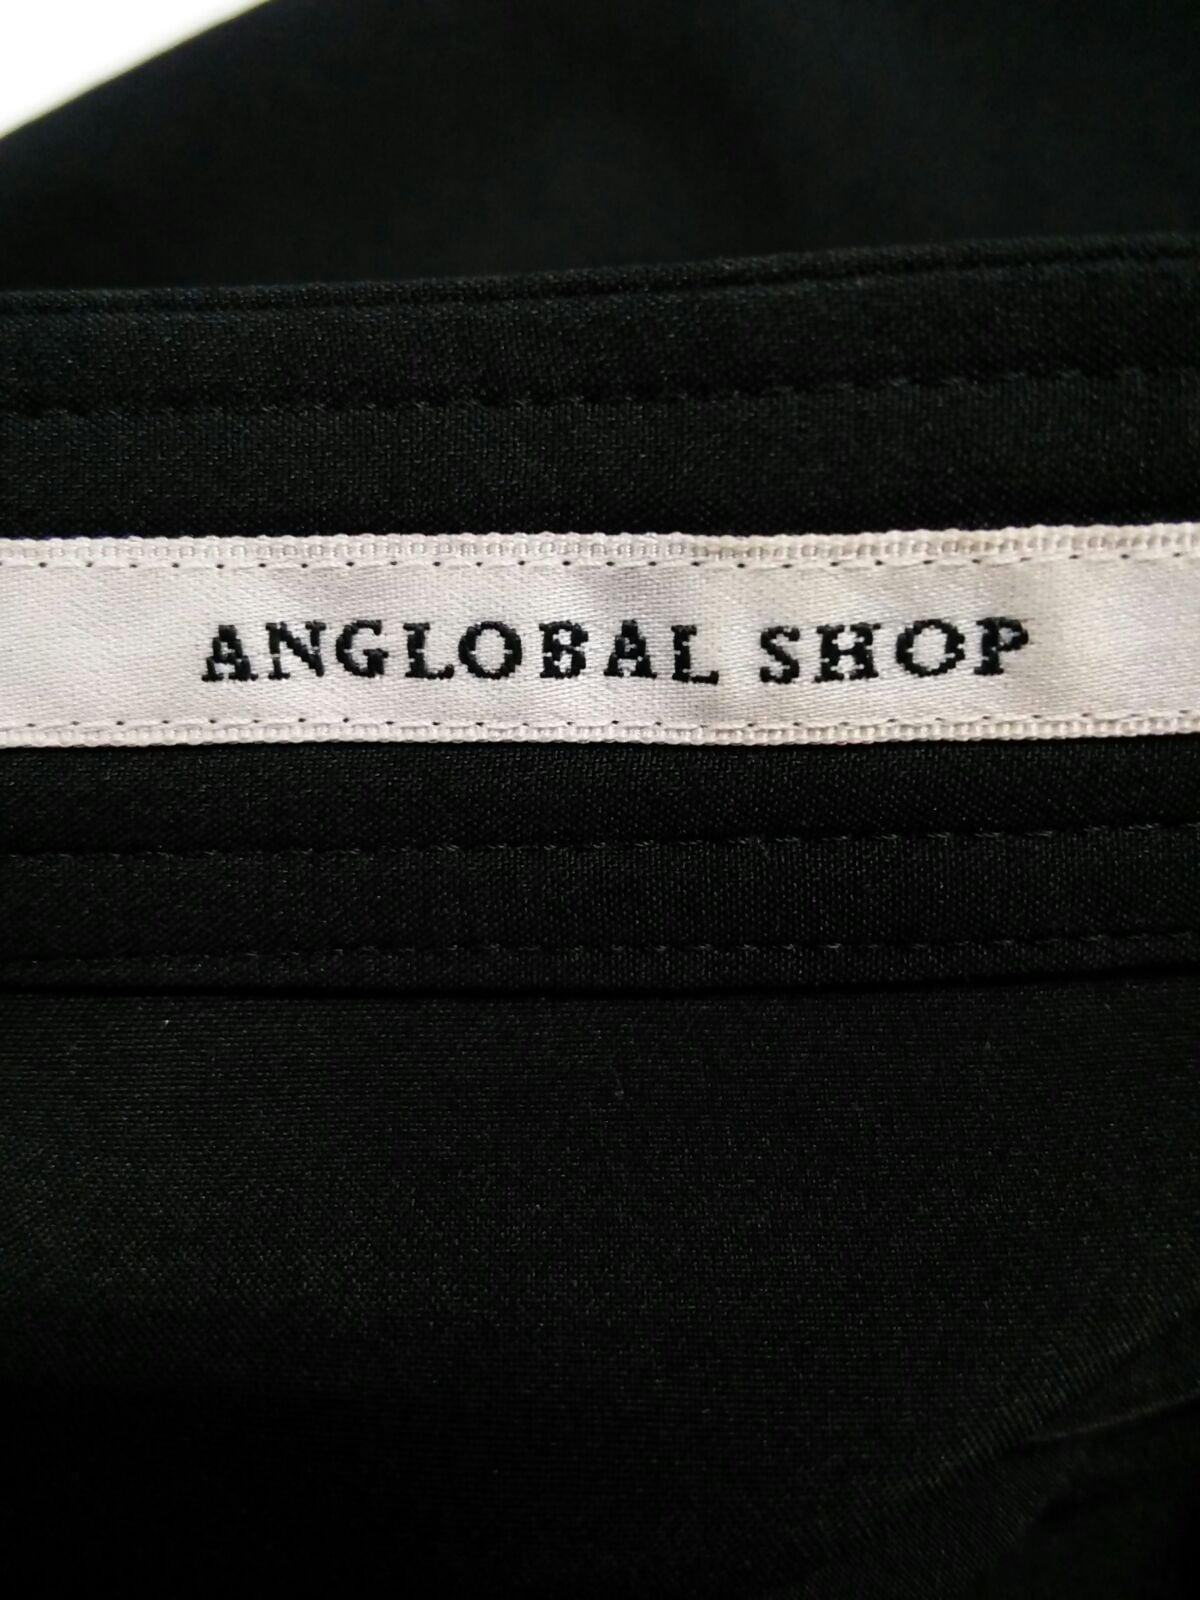 ANGLOBAL SHOP(アングローバルショップ)のワンピース